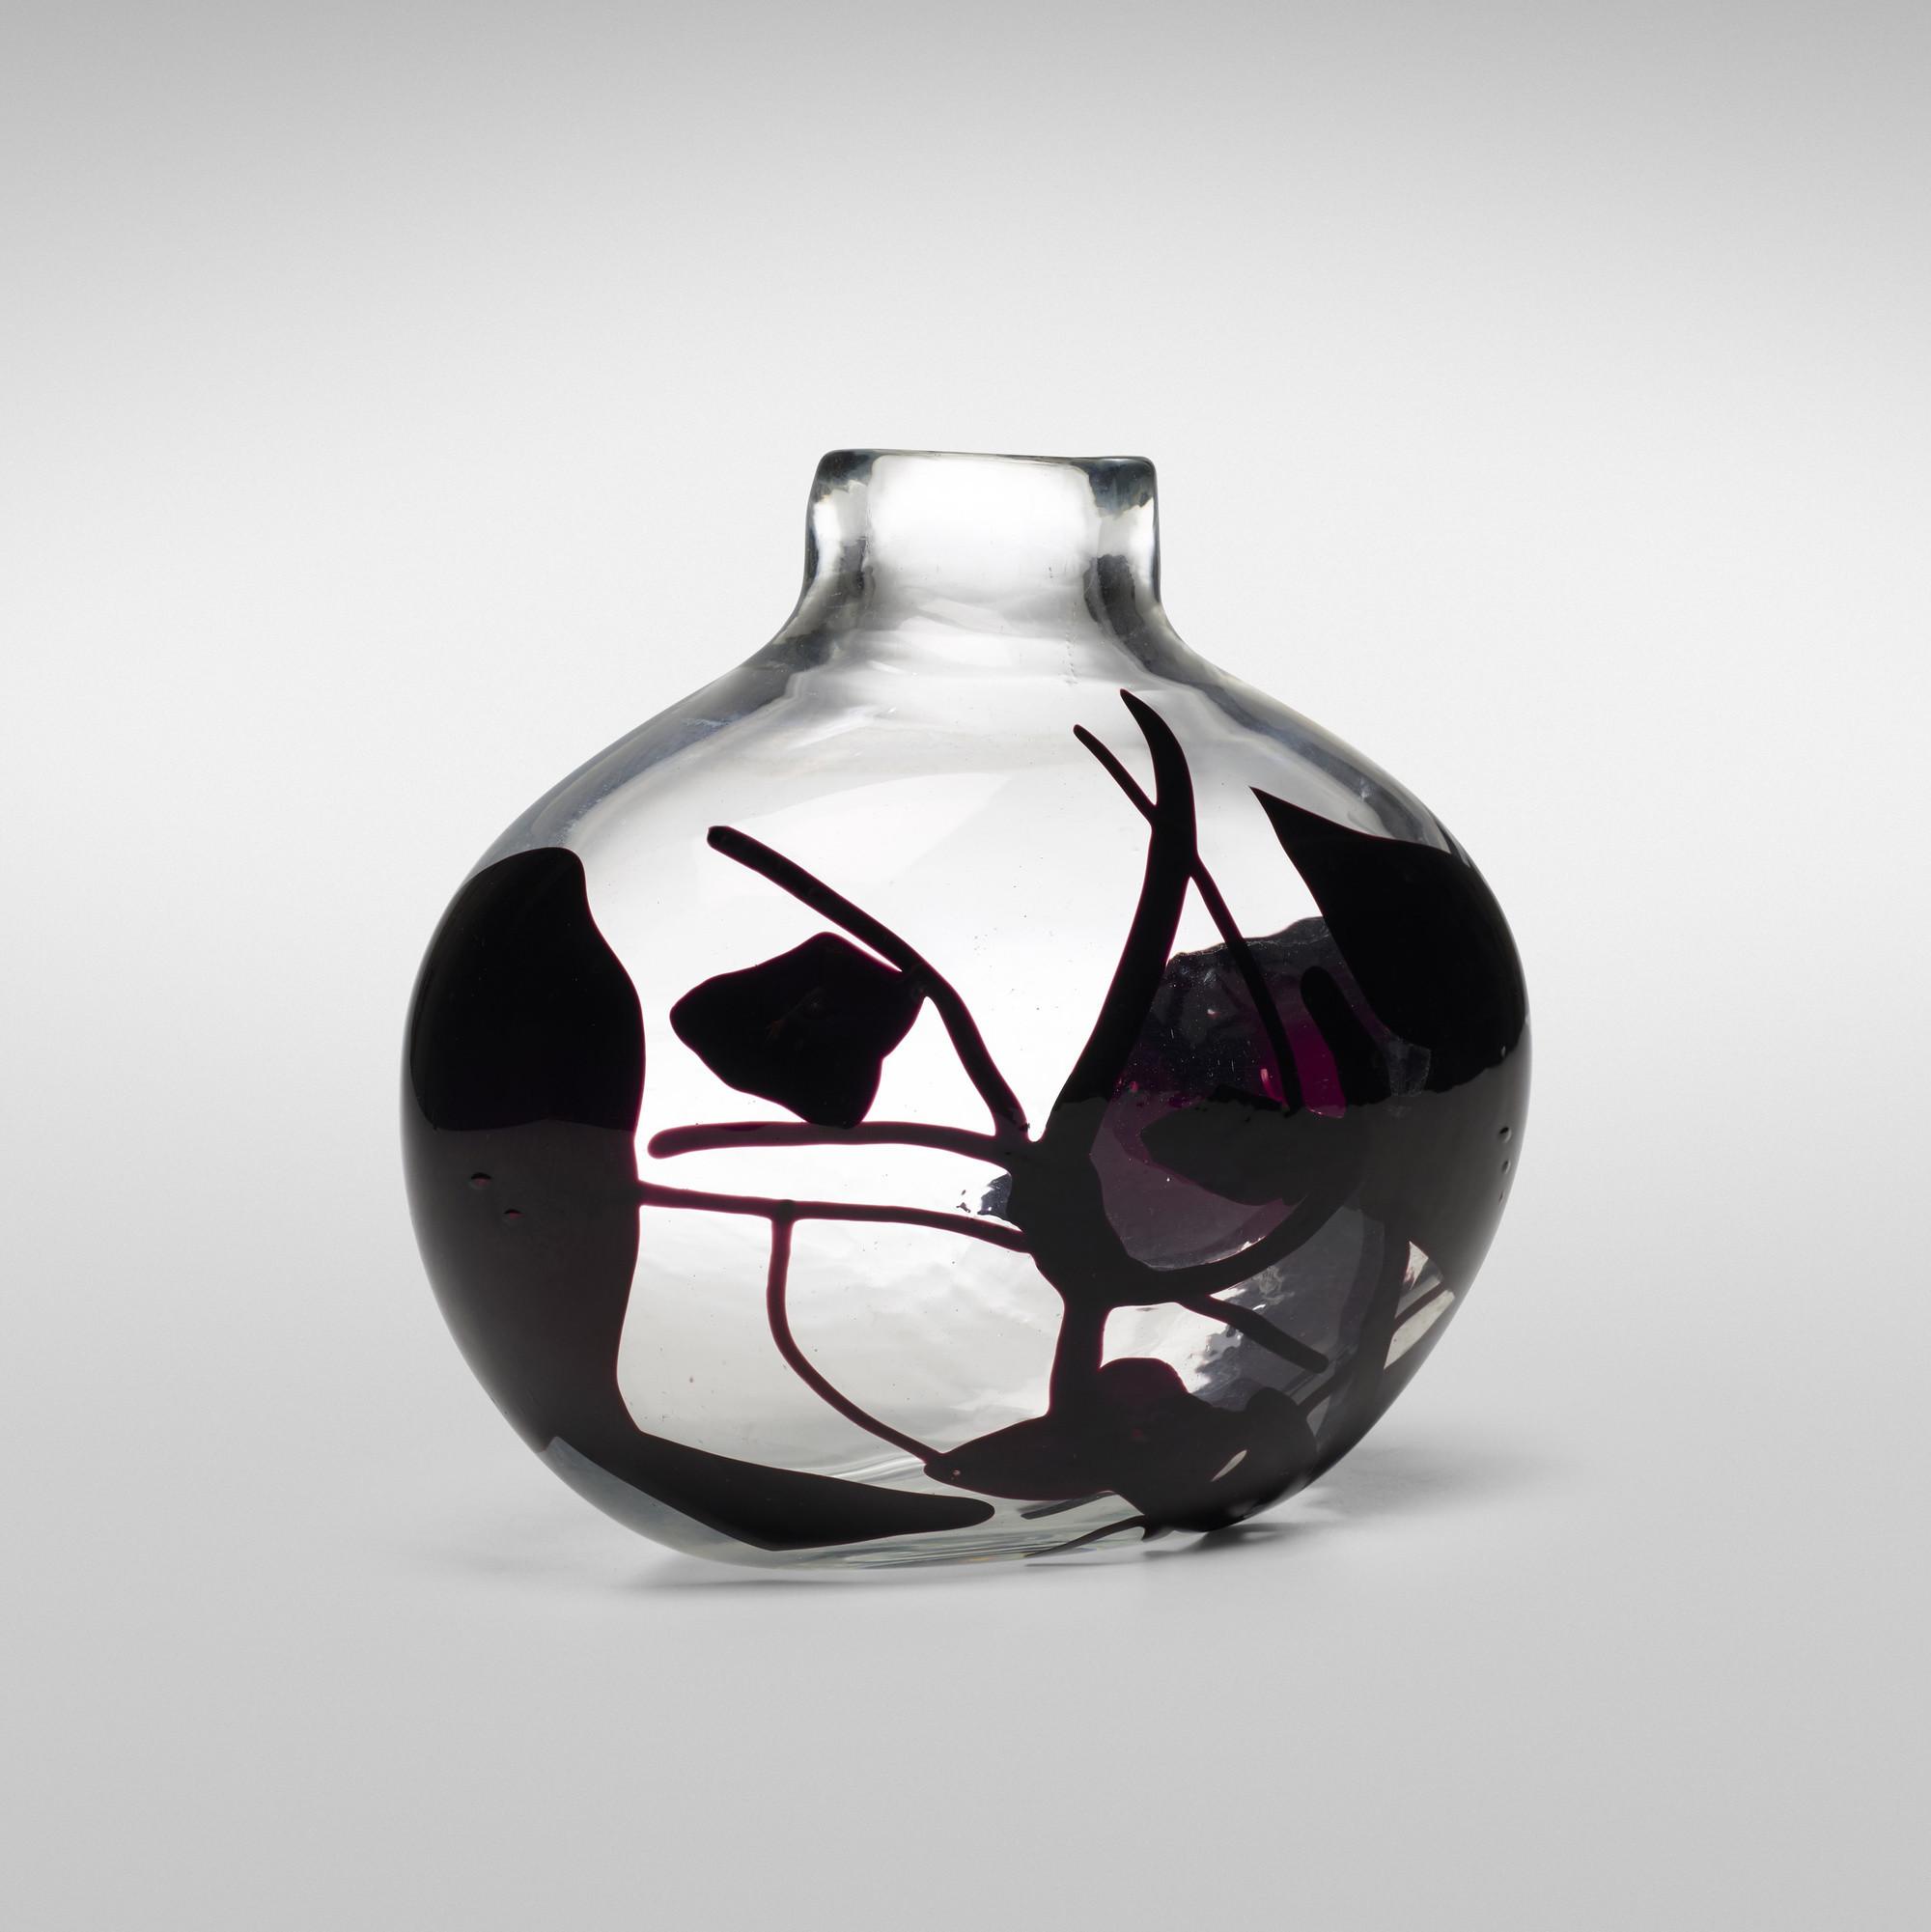 Small Vintage Glass Vases Of 139 Fulvio Bianconi Important Con Macchie Vase Model 4324 In 139 Fulvio Bianconi Important Con Macchie Vase Model 4324 2 Of 4